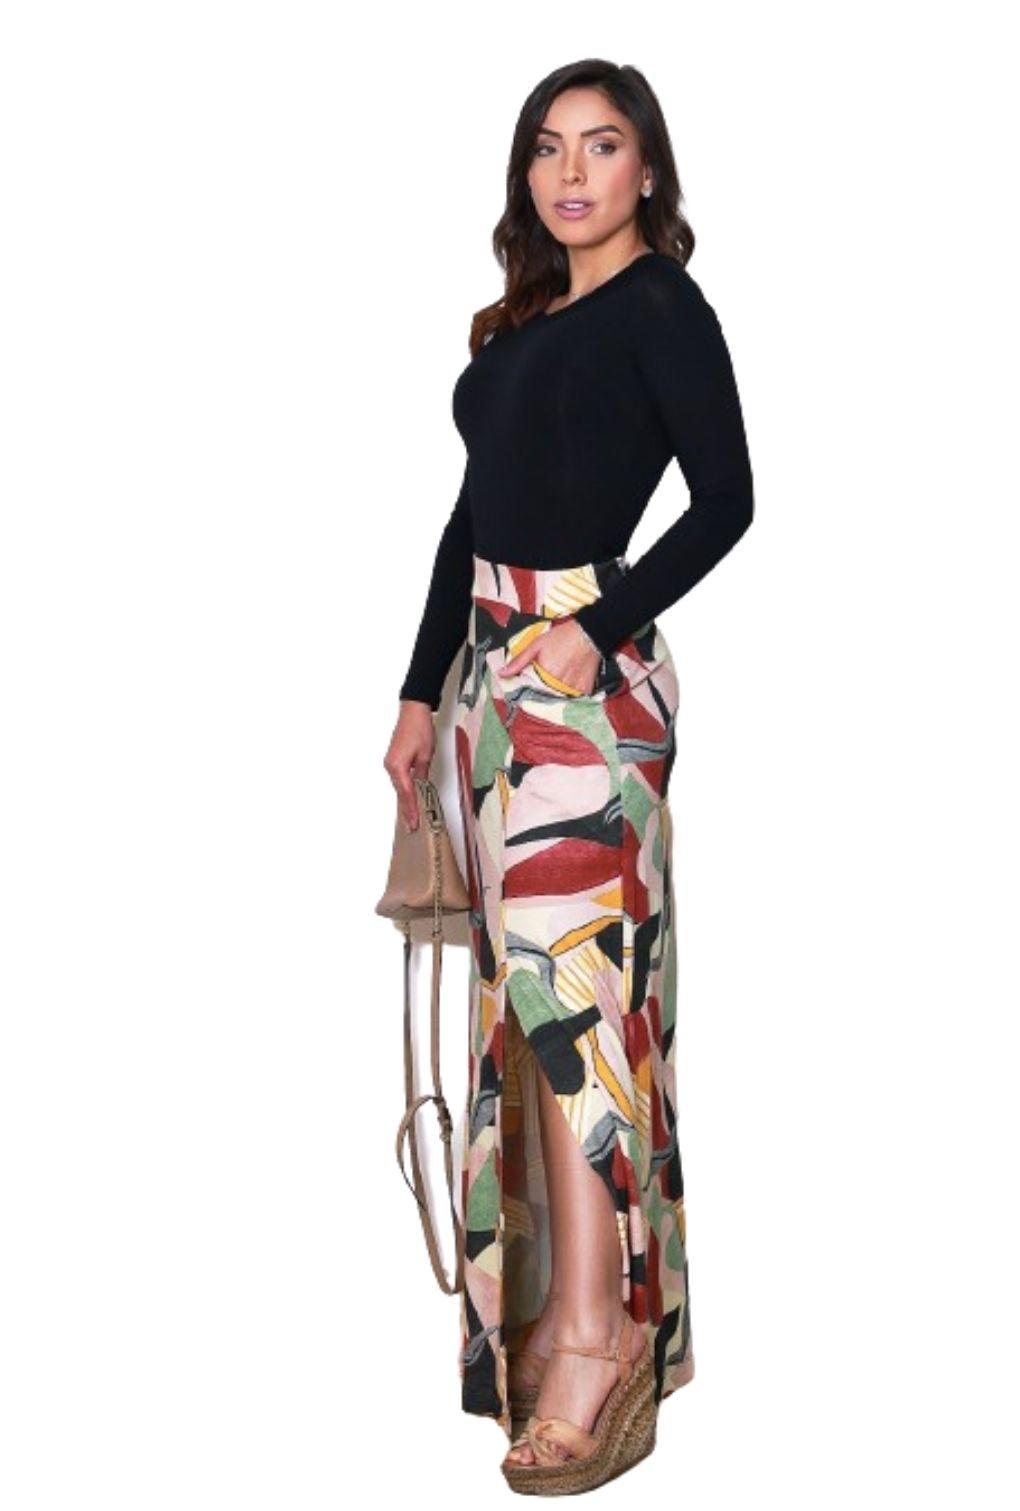 Saia Longa Estampada Feminina Viscolycra  - ModaStore   Moda Feminina